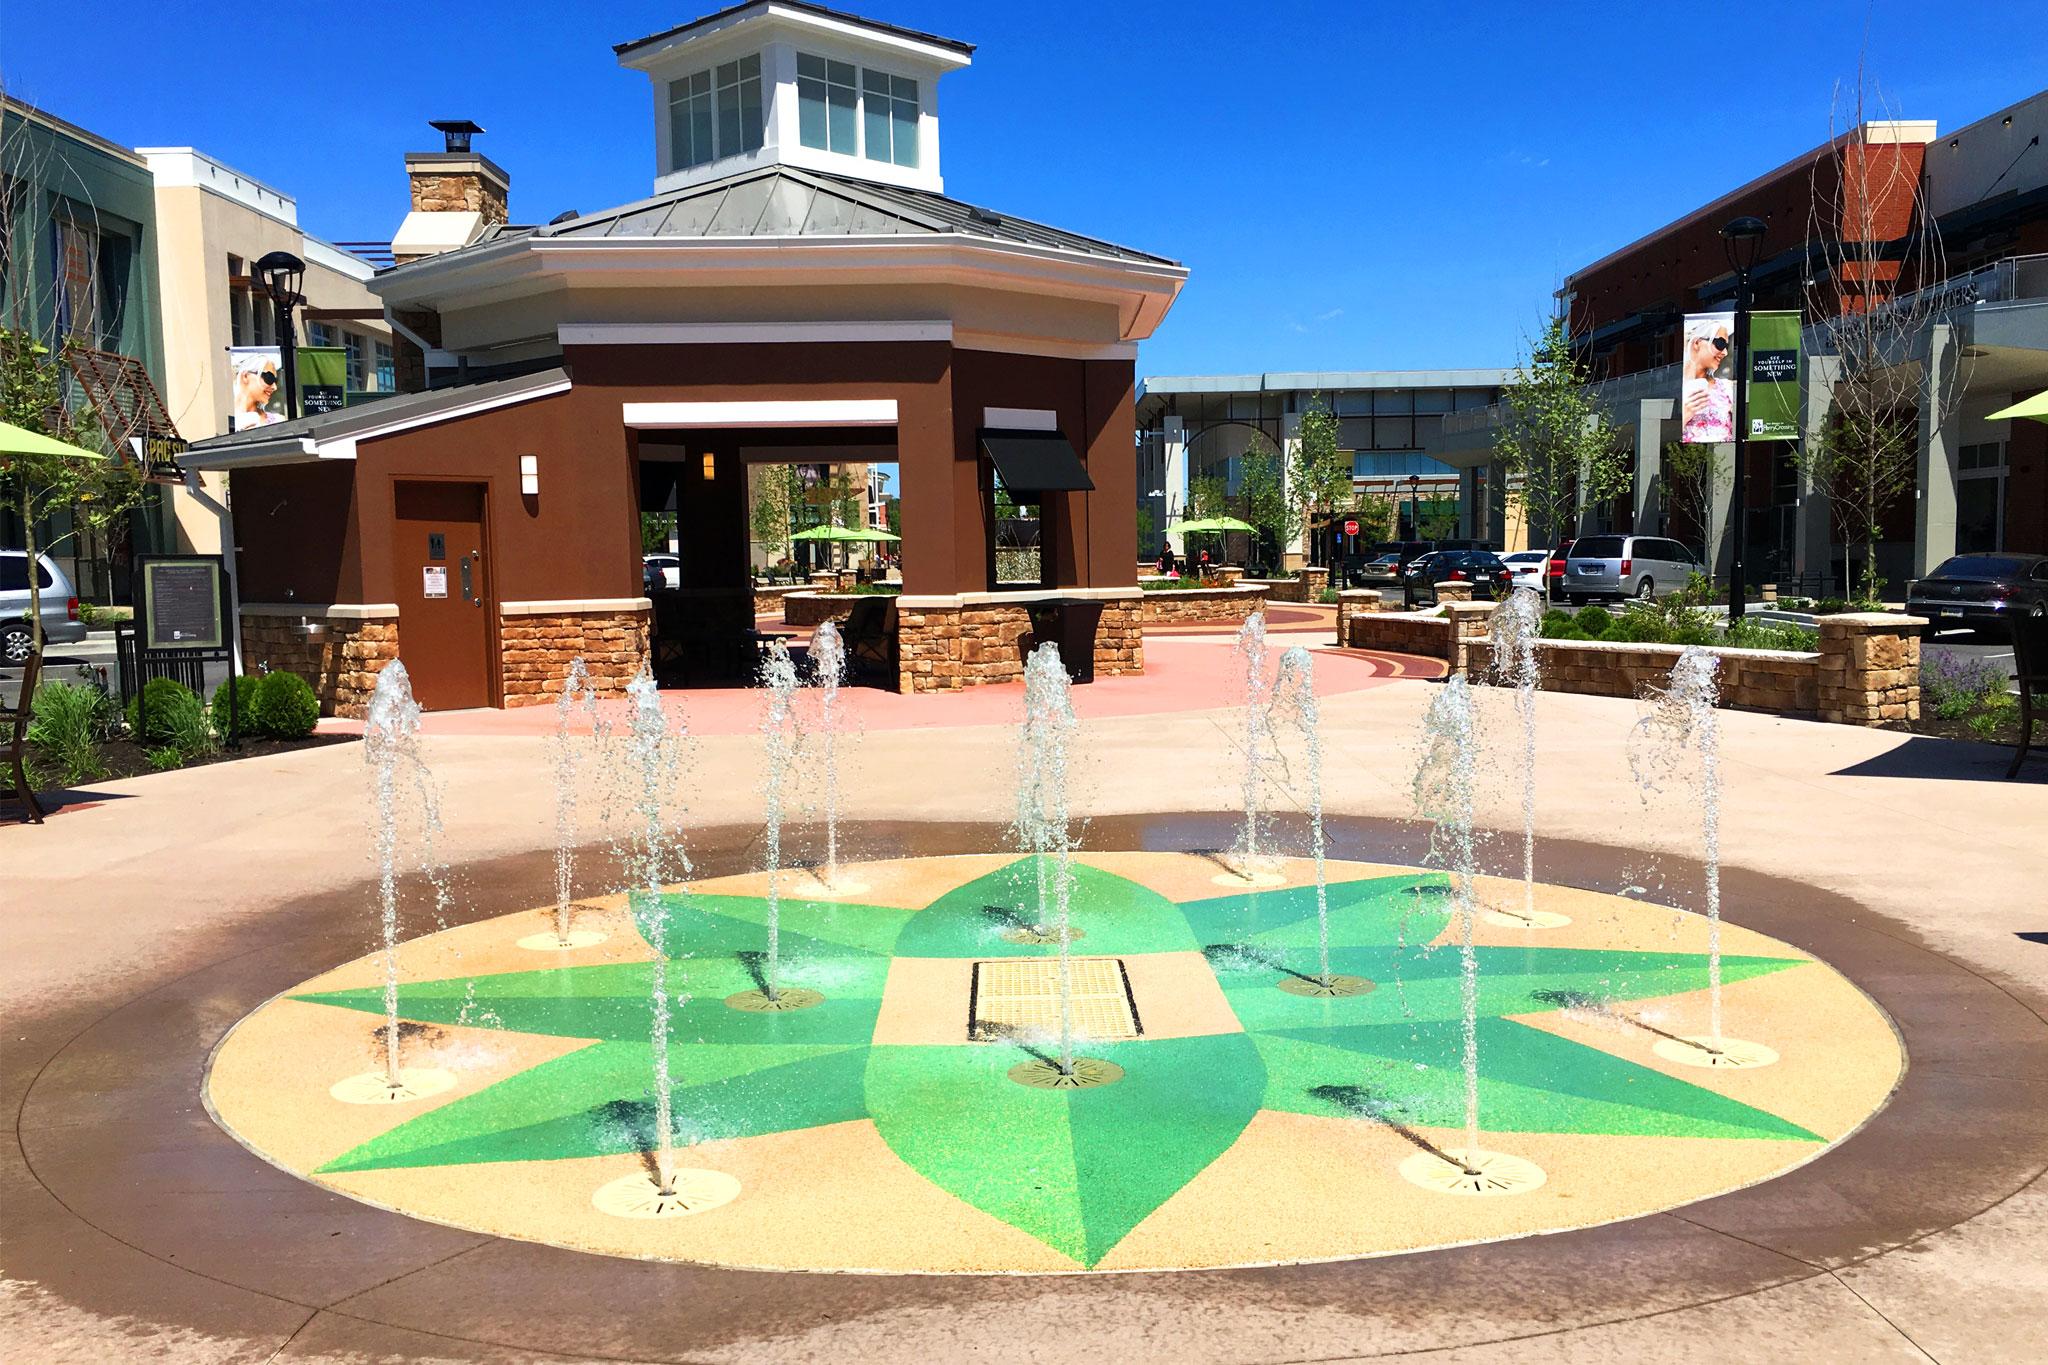 Splash Pad in Retail Landscape Architecture Design